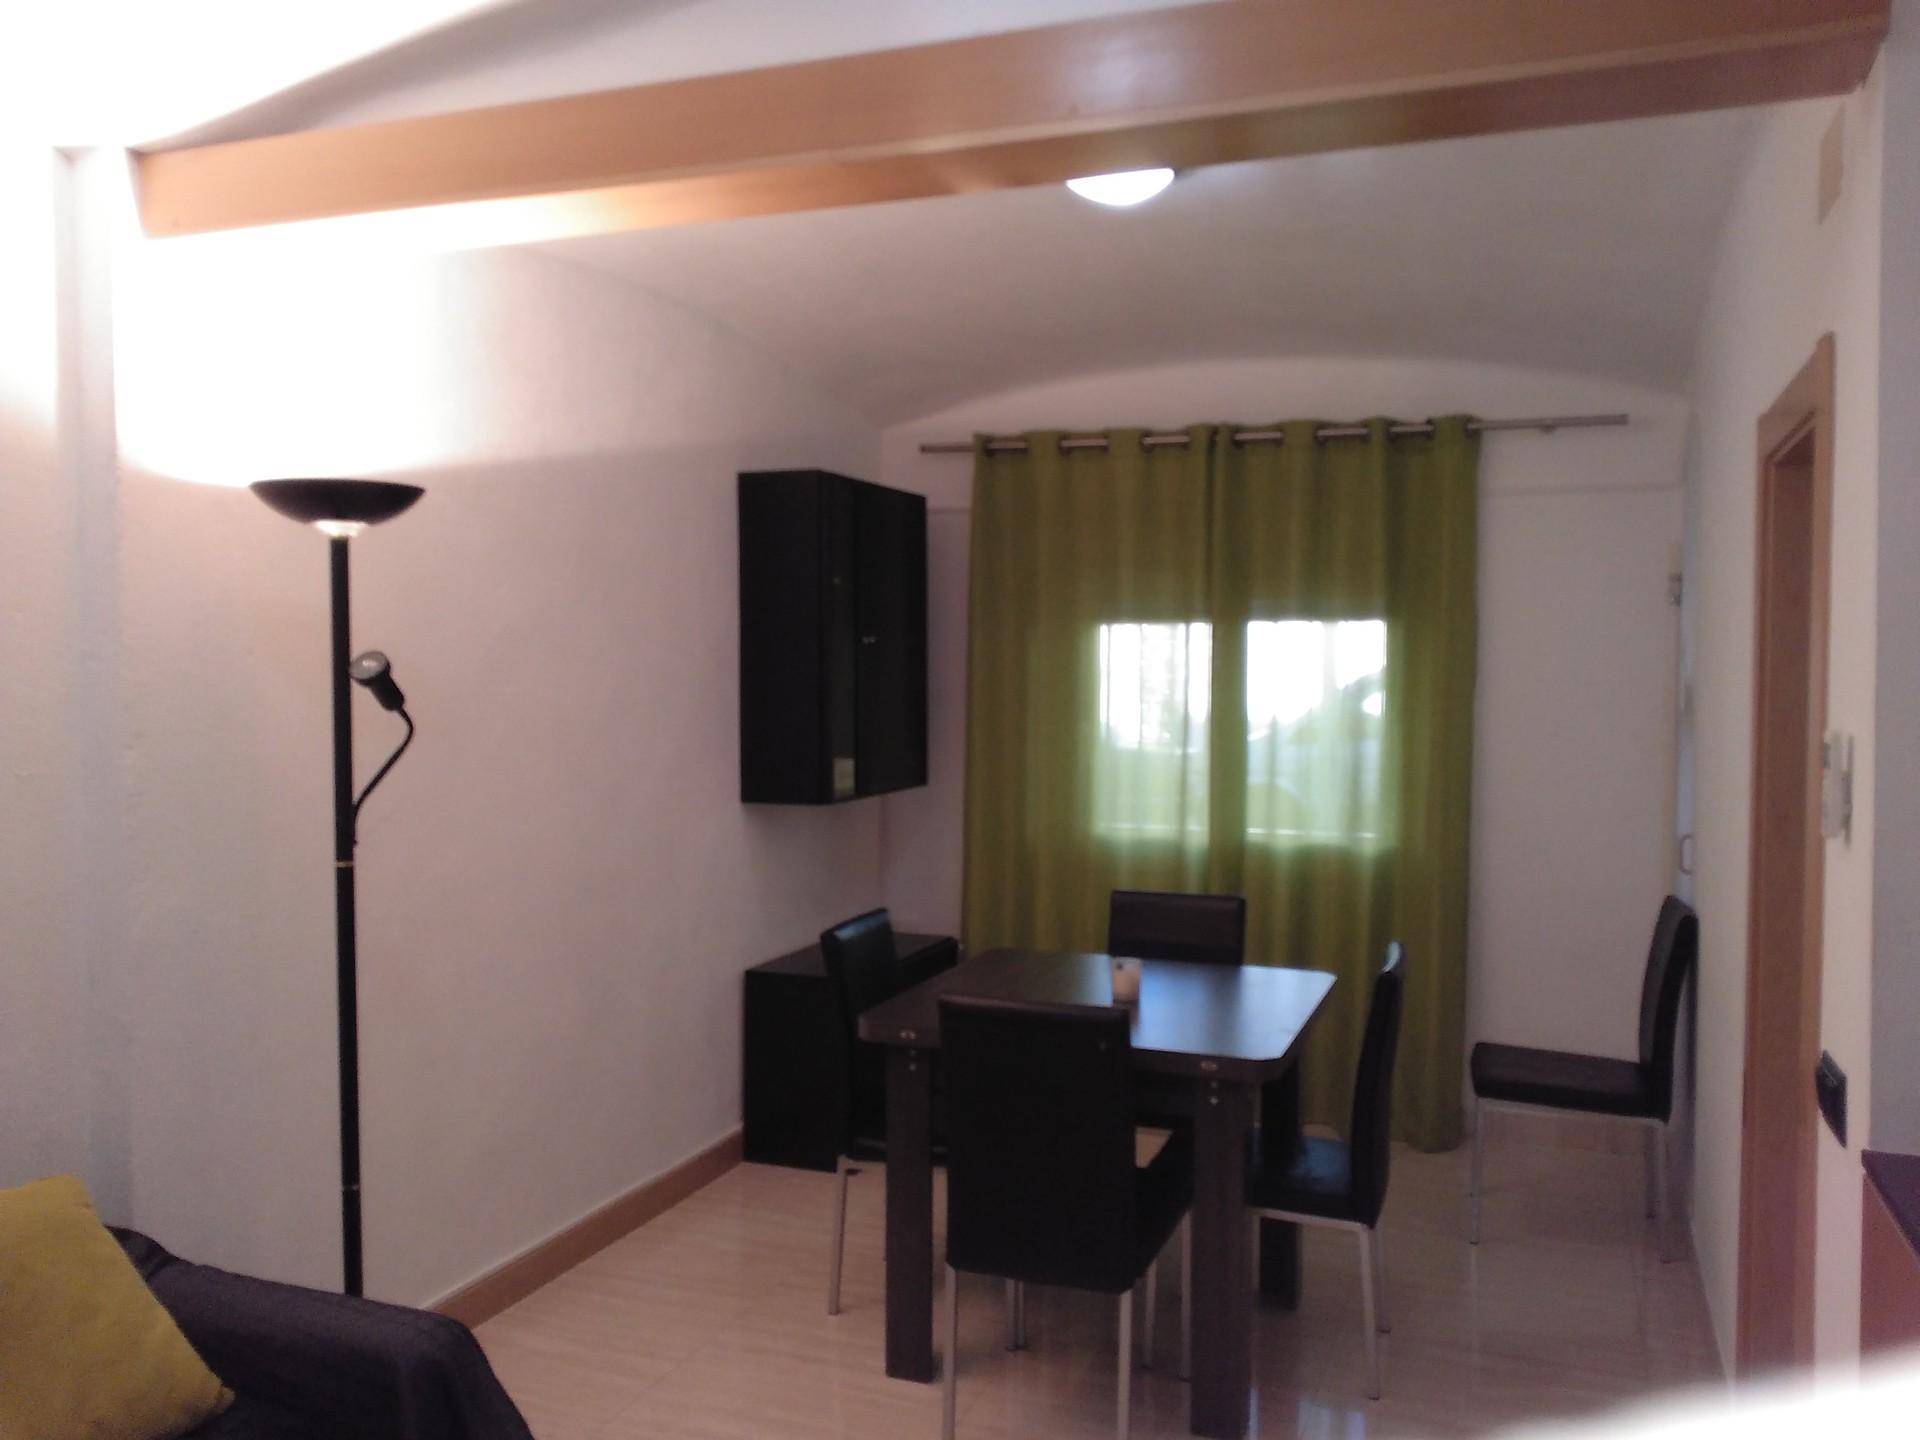 habitacion-casa-tranquila-e393039f3ca1214e563eb04c8d14715f